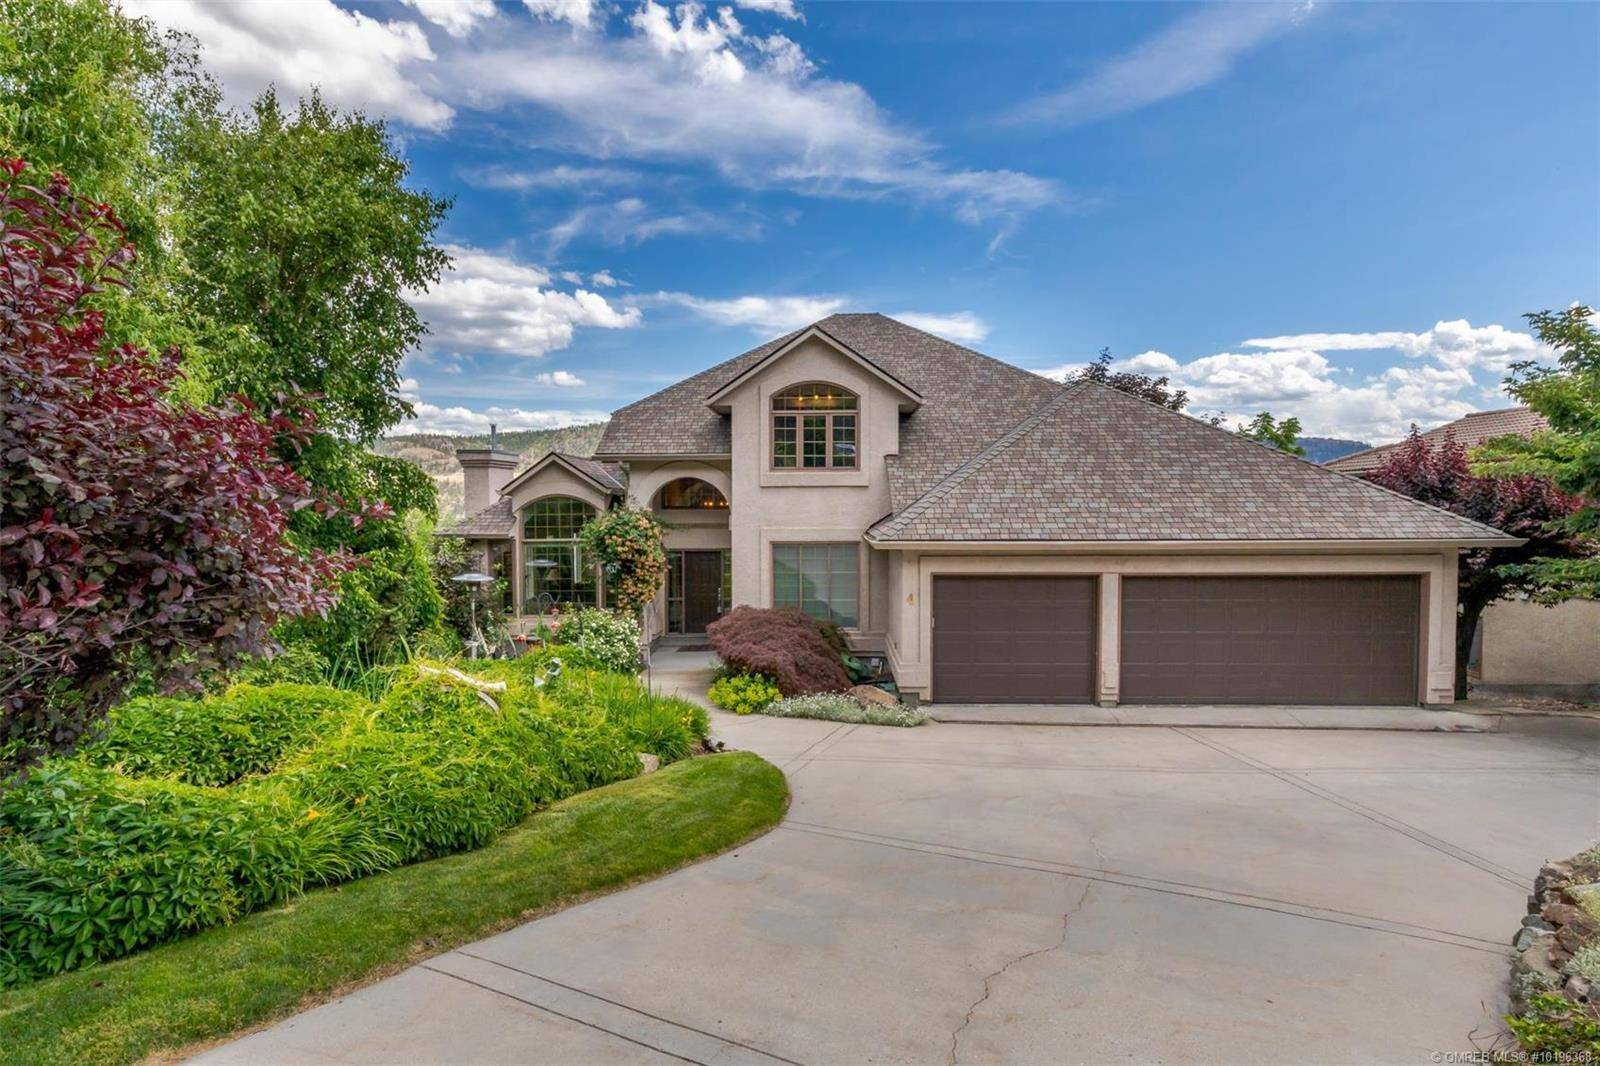 House for sale at 695 Westside Rd North Unit 4 Kelowna British Columbia - MLS: 10196368